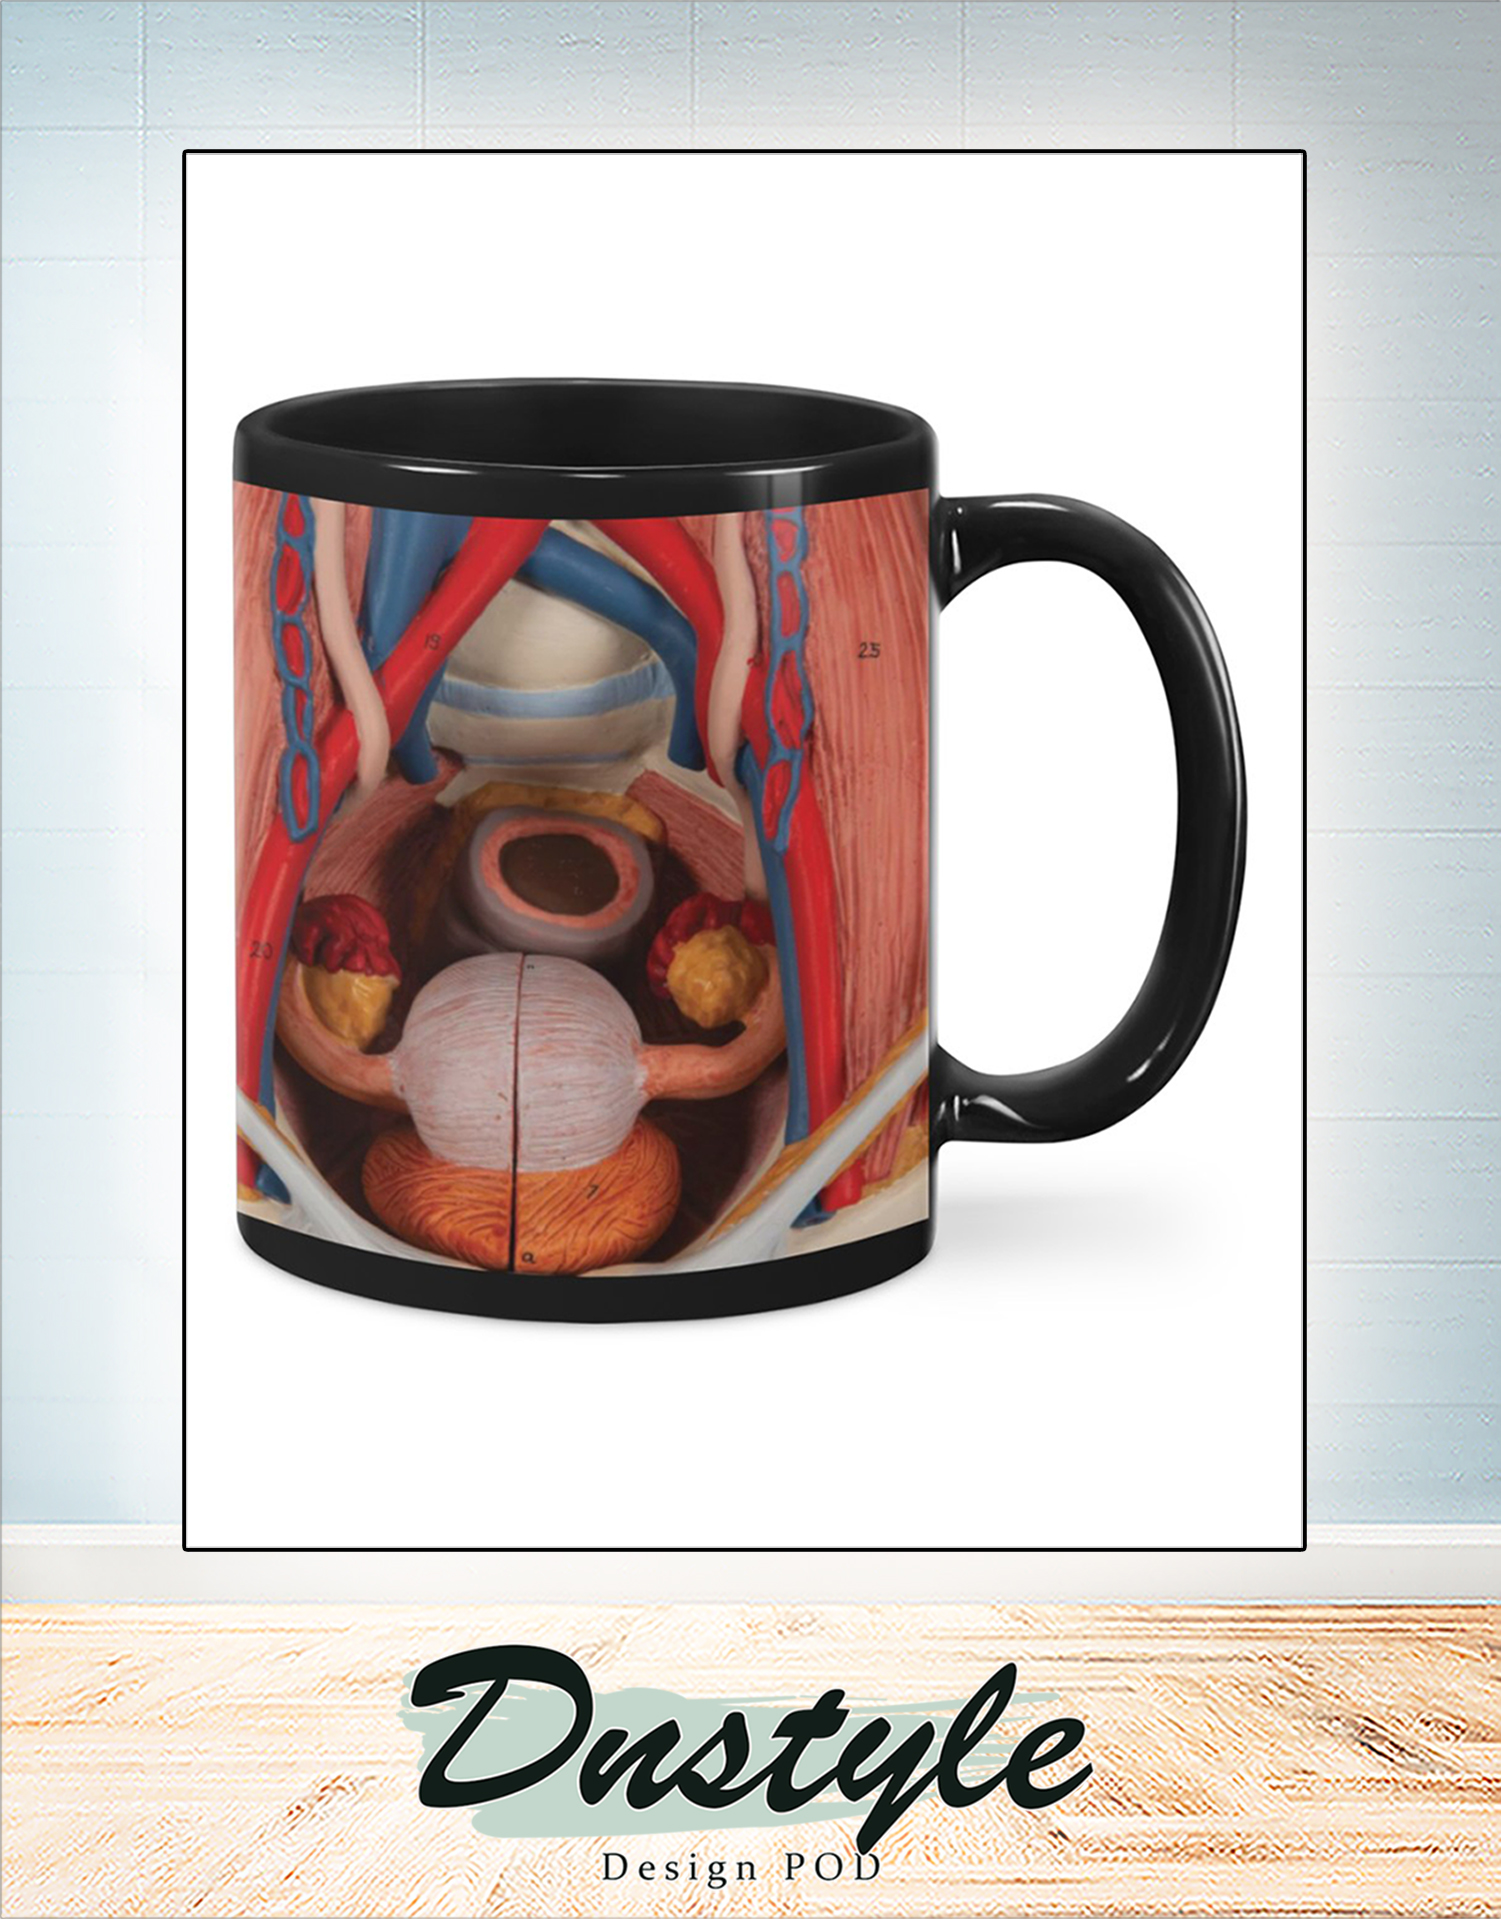 Urinary mug